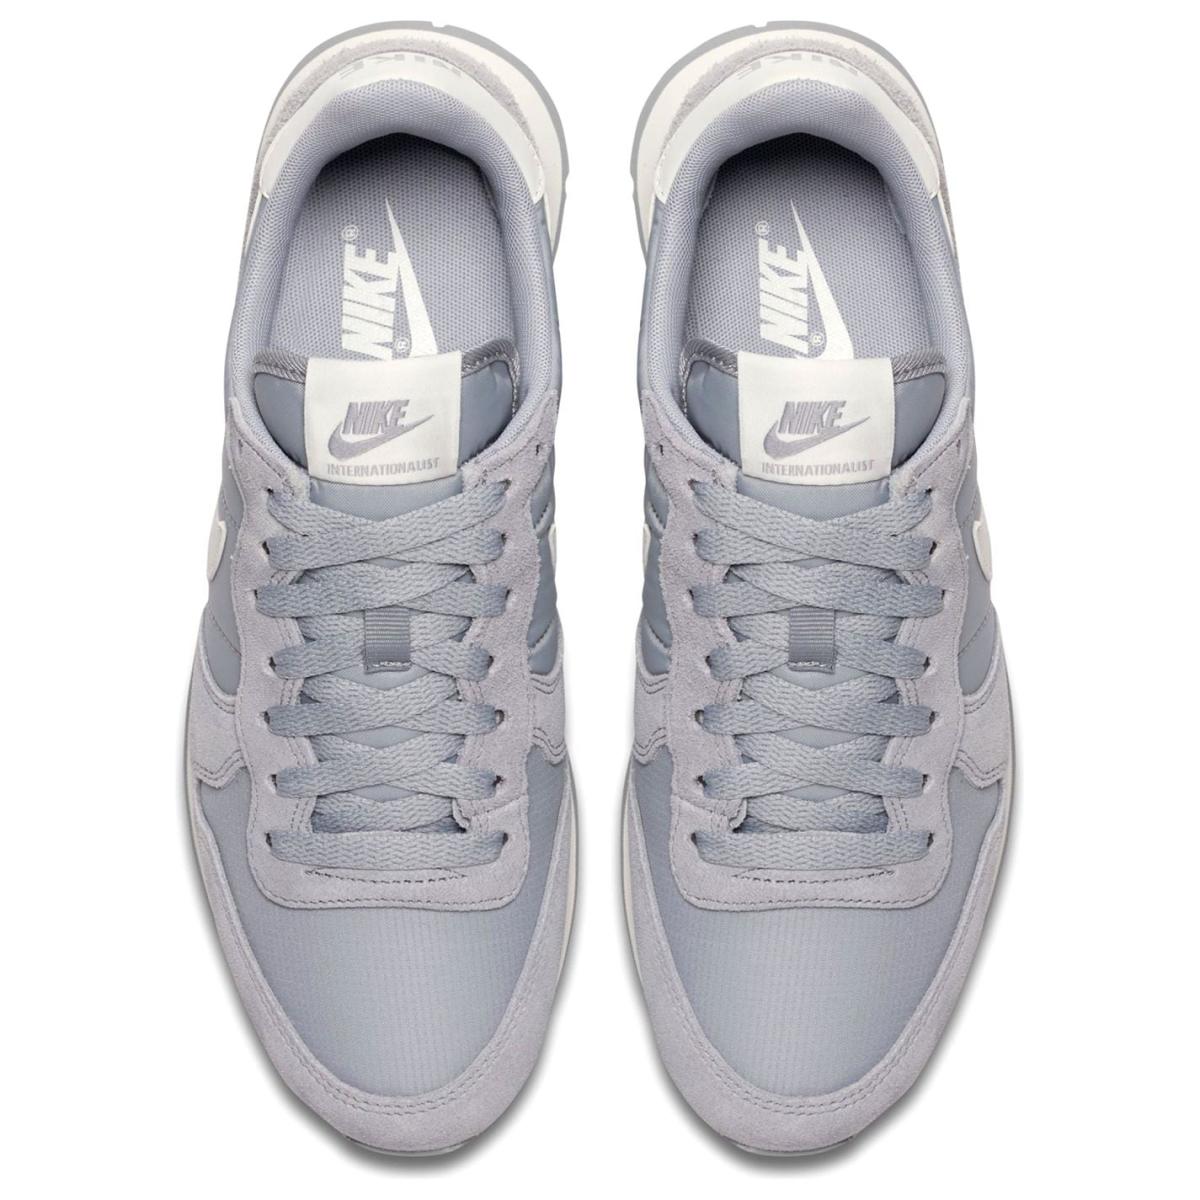 Nike International Turnschuhe Damen Sneaker Sportschuhe Laufschuhe 4015